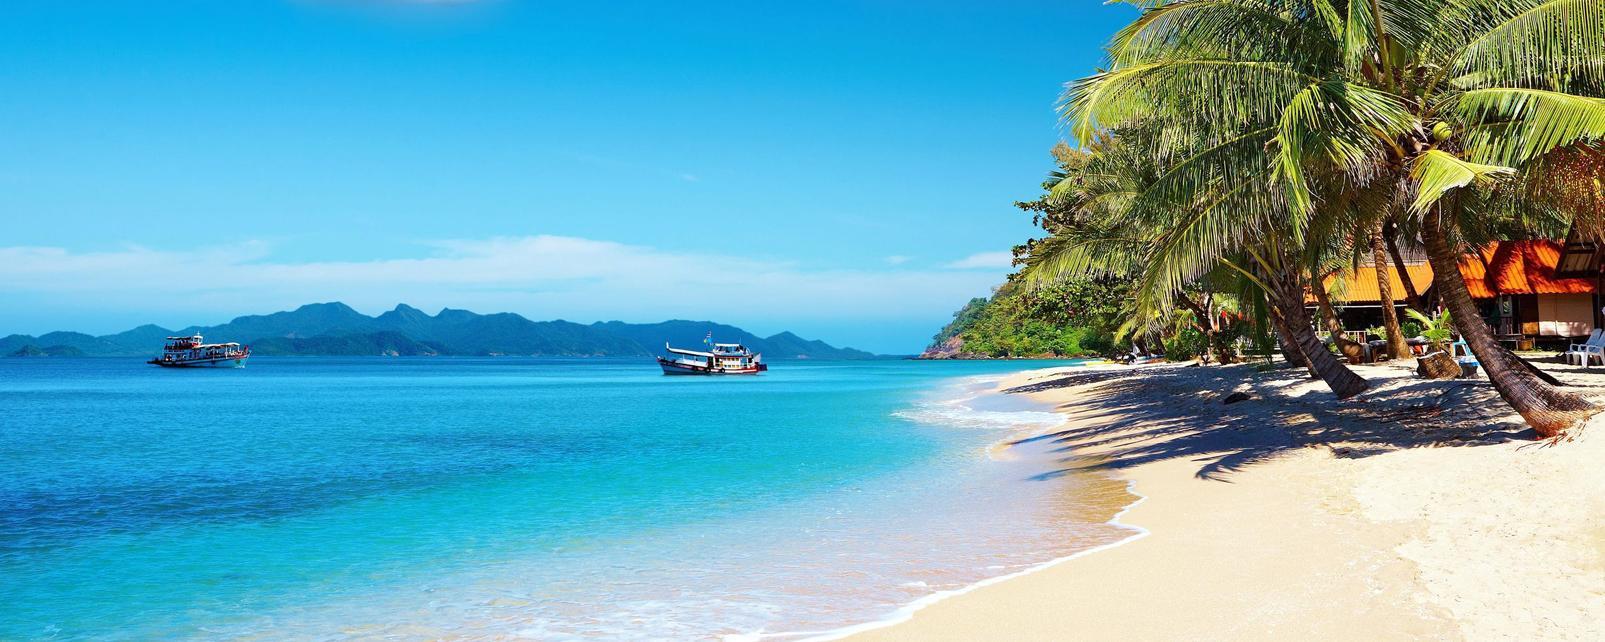 Vol Hotel Thailande Pas Cher